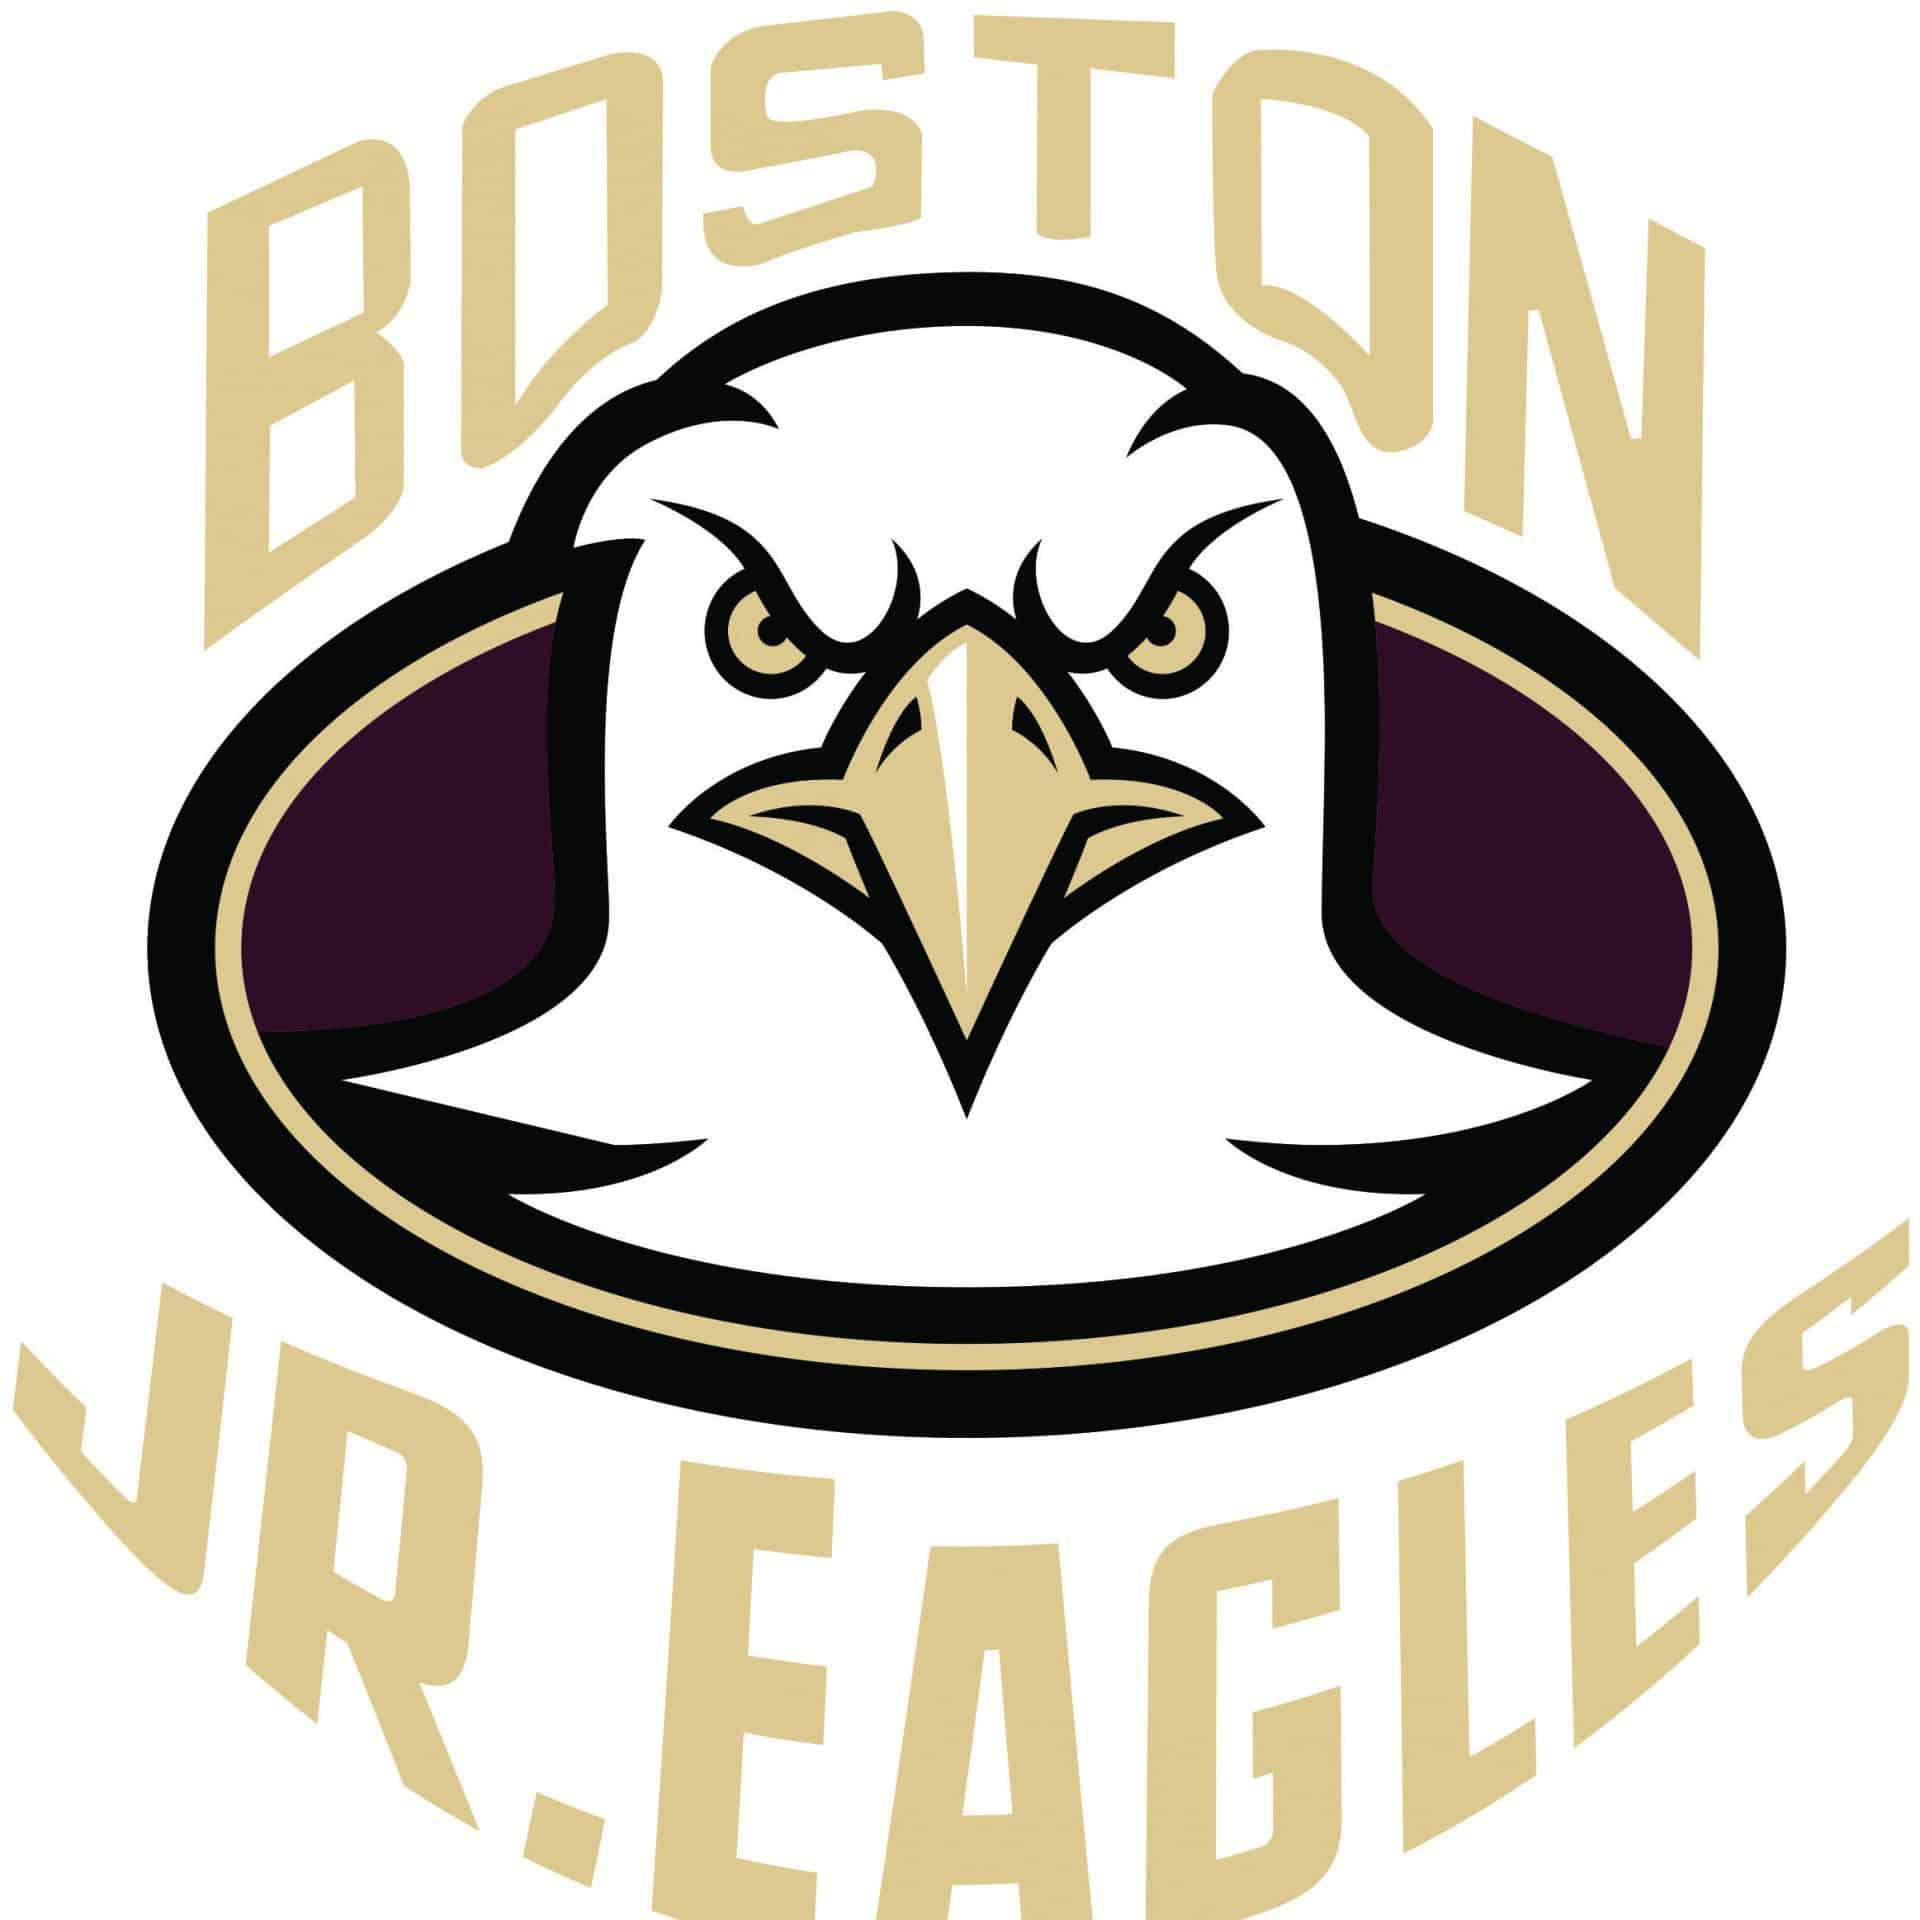 Boston Jr. Eagles